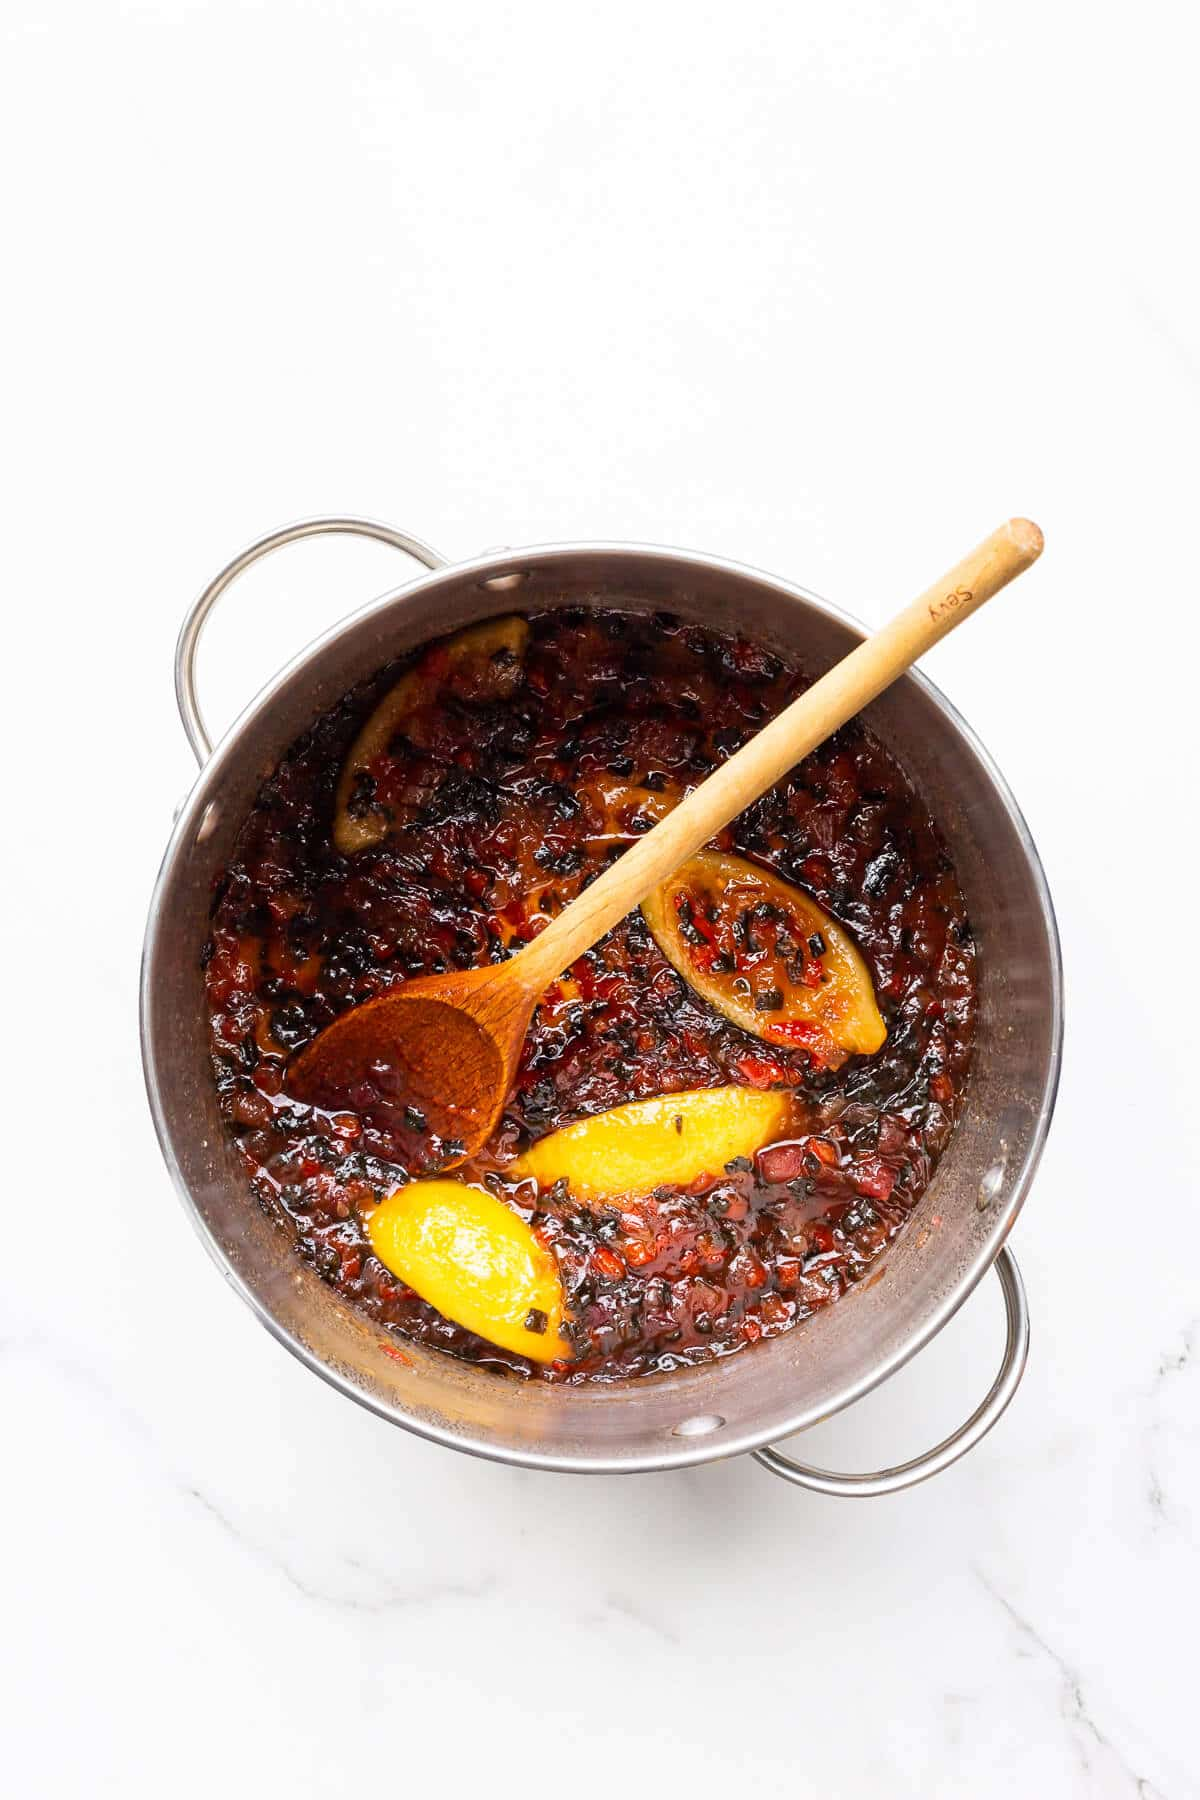 A pot of jalapeño jam ready to be transferred to jars.